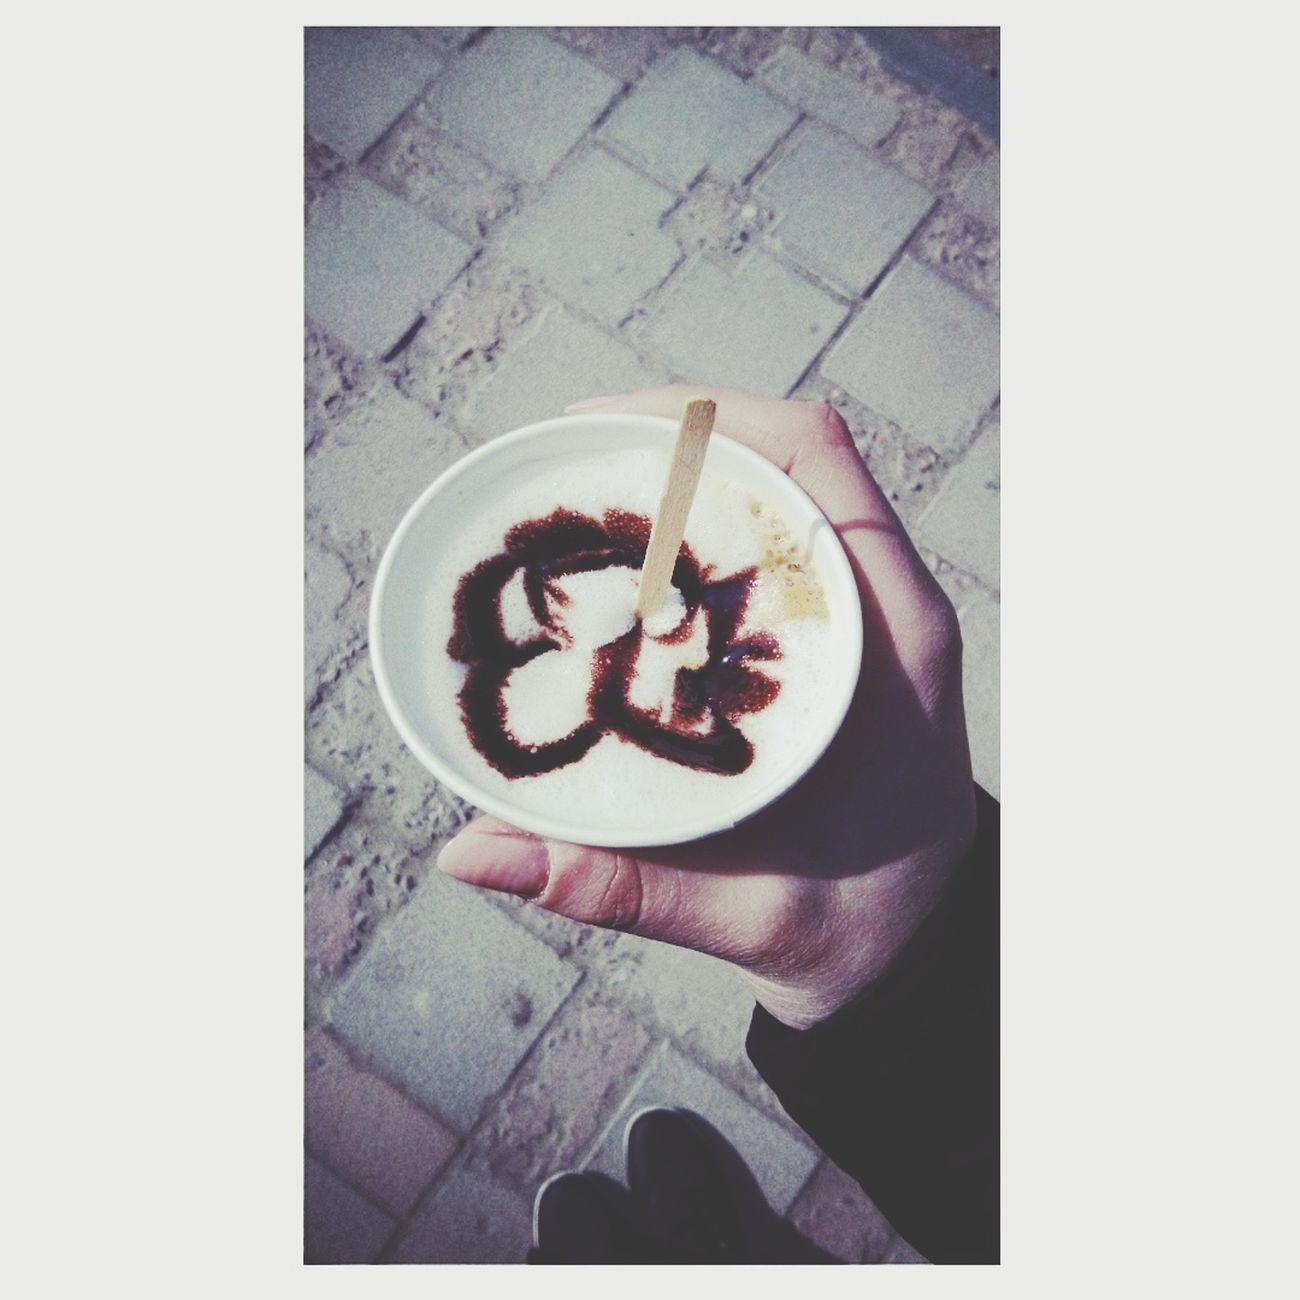 Coffee Yummy♡ Sweet Loveit❤ Moccachino